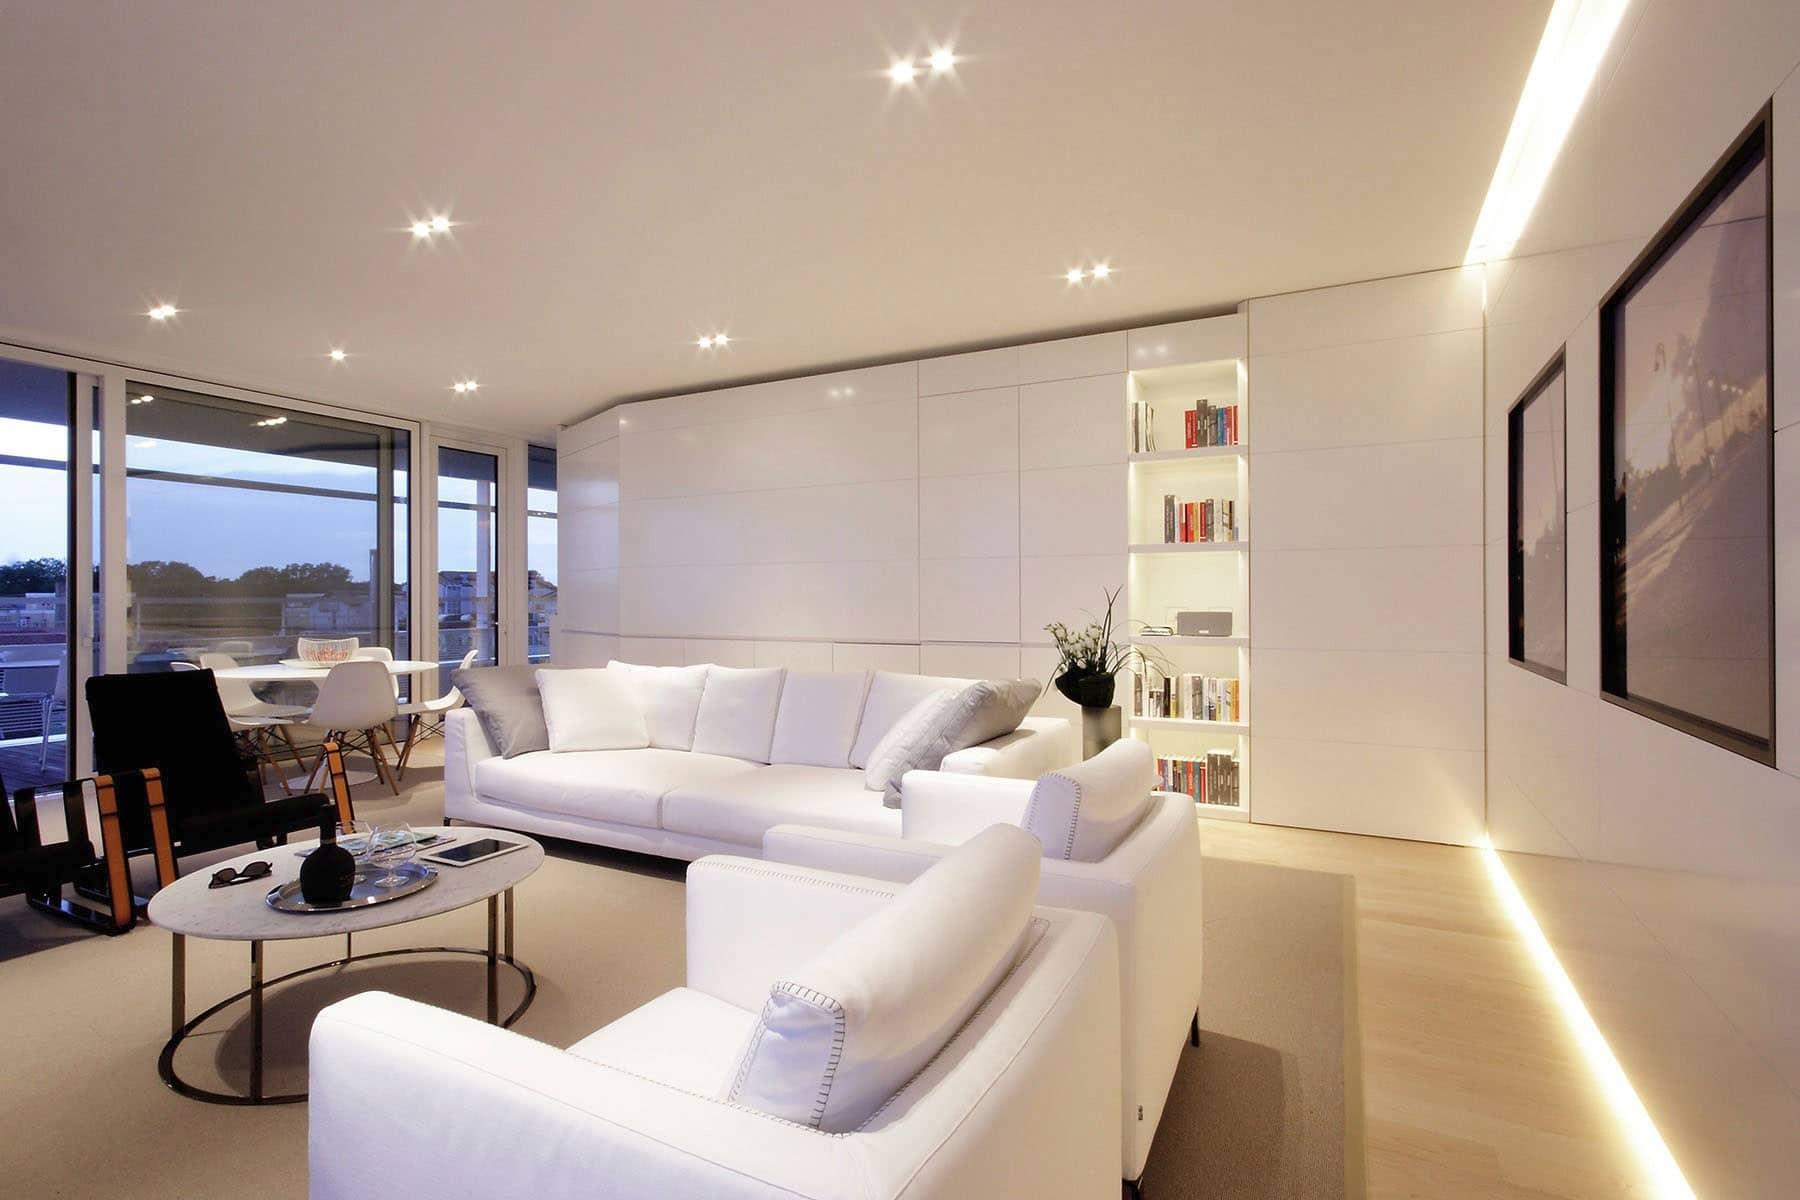 Plano departamento peque o dos dormitorios construye hogar for Diseno de interiores apartamentos pequenos